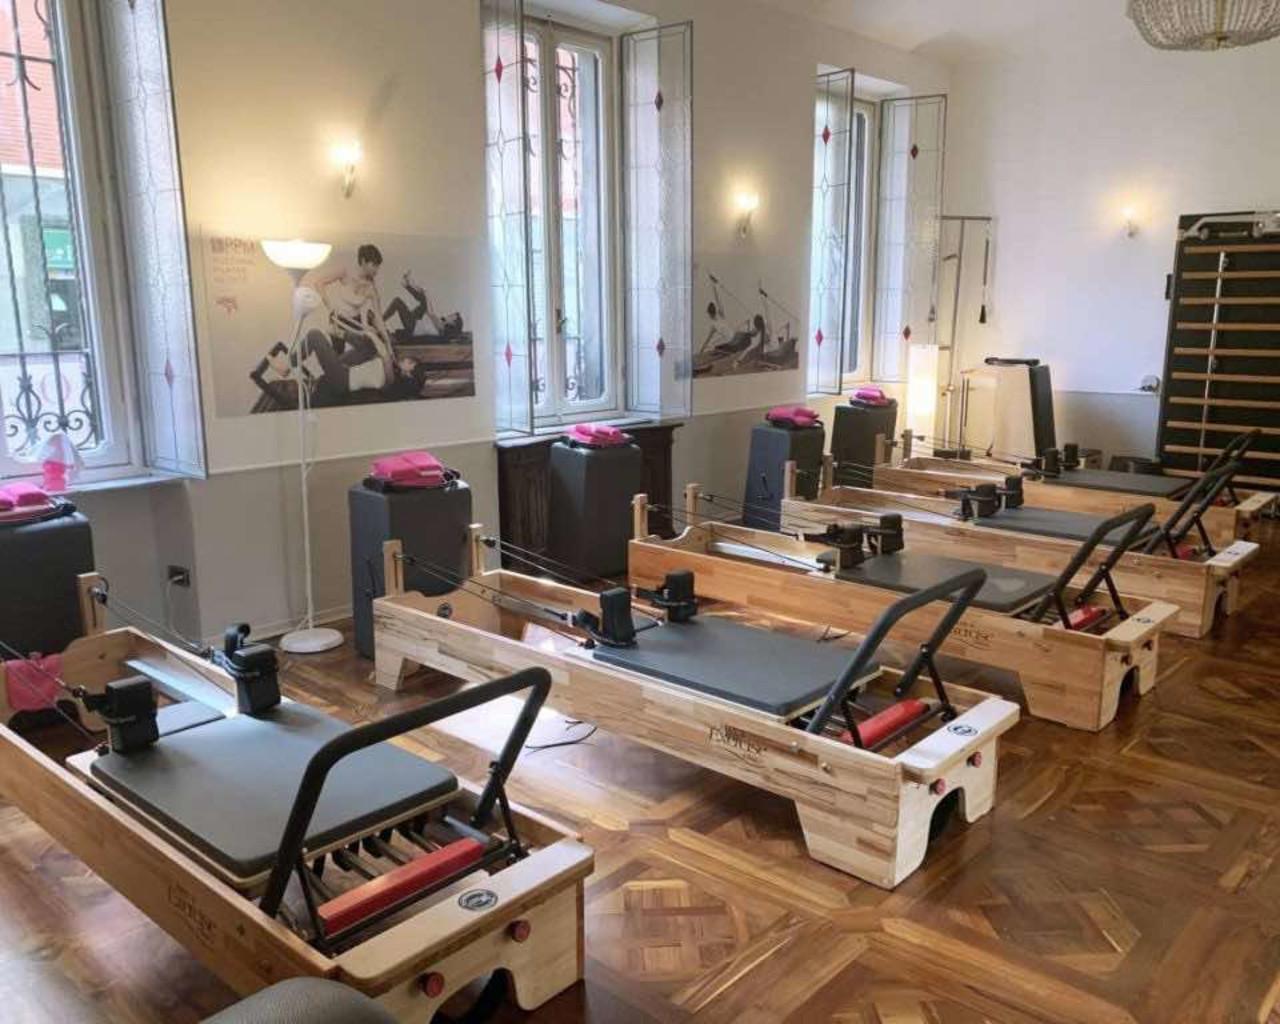 Yoga Pilates PPM Crocetta